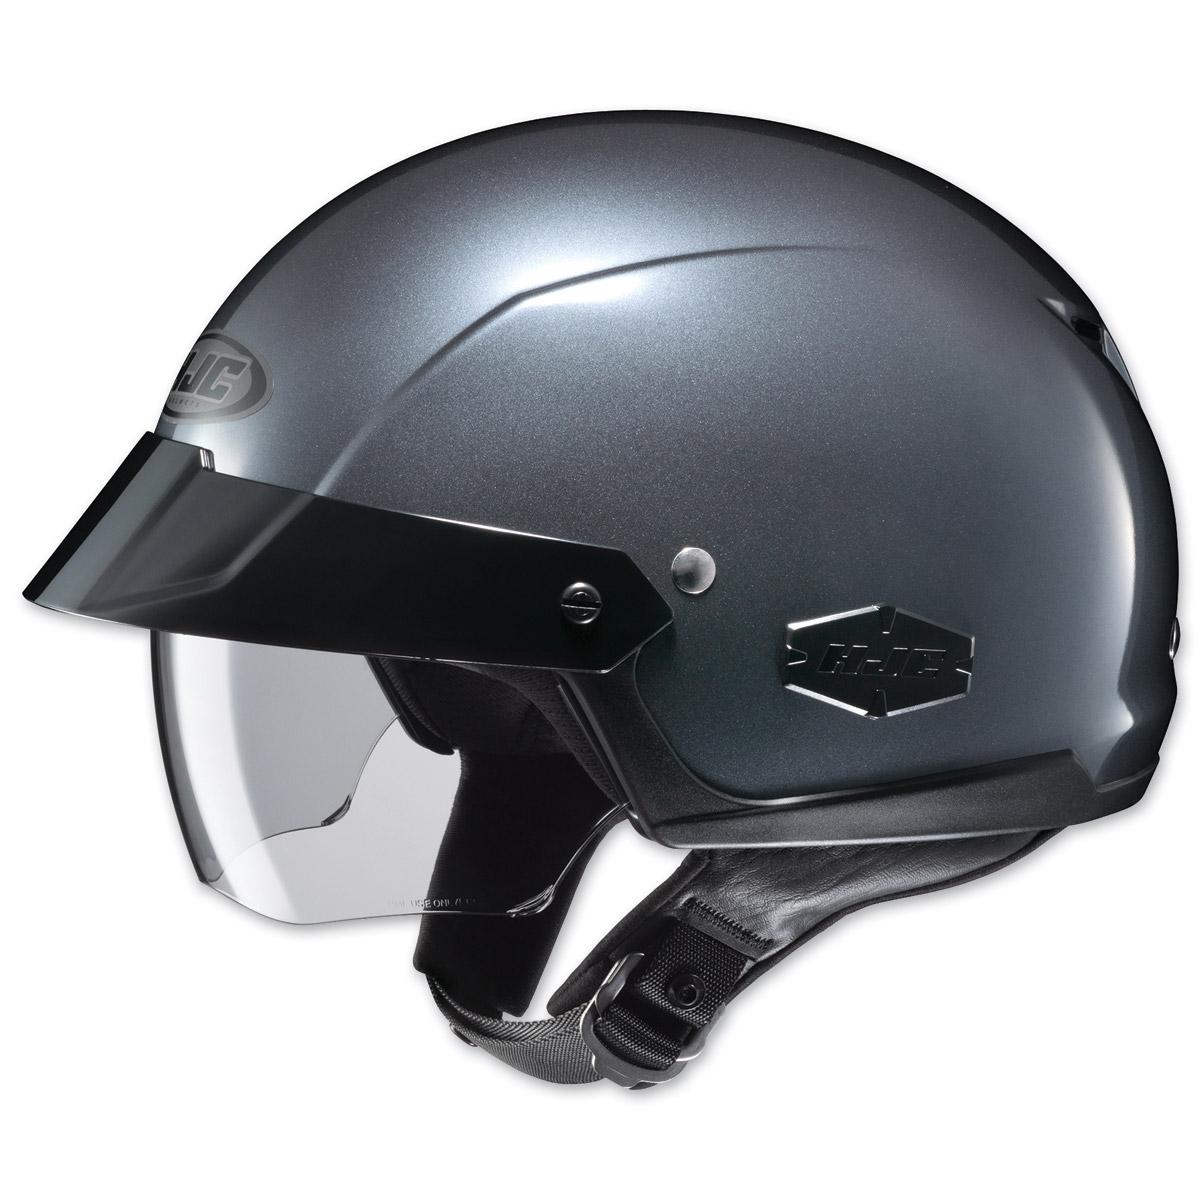 HJC IS-Cruiser Metallic Anthracite Half Helmet